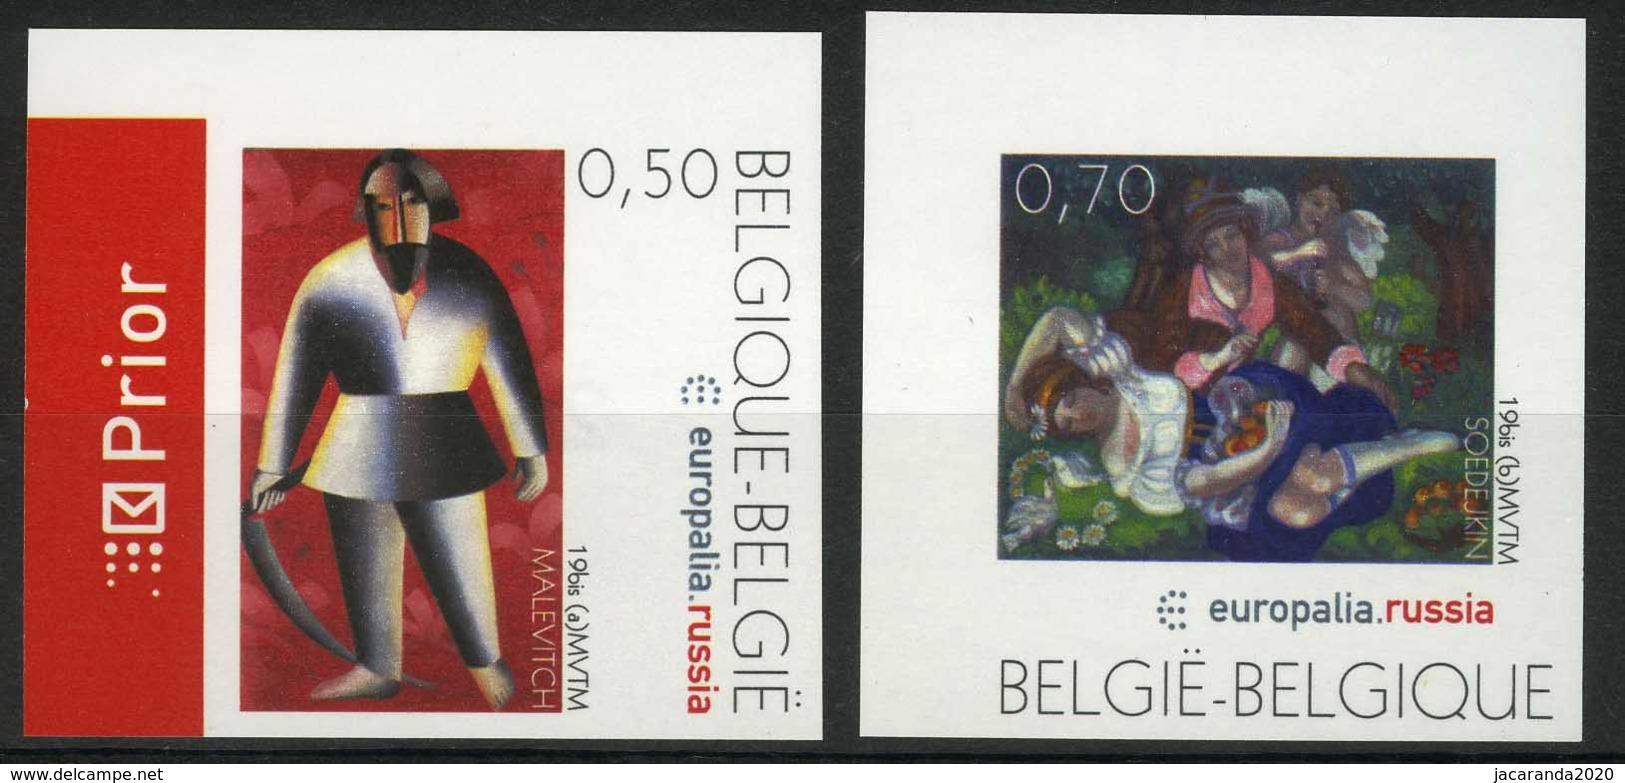 [A2982] België 3430/31 – Europalia – Rusland – Schilderijen – Russie – Tableaux – ON – Cote: 20,00 - België